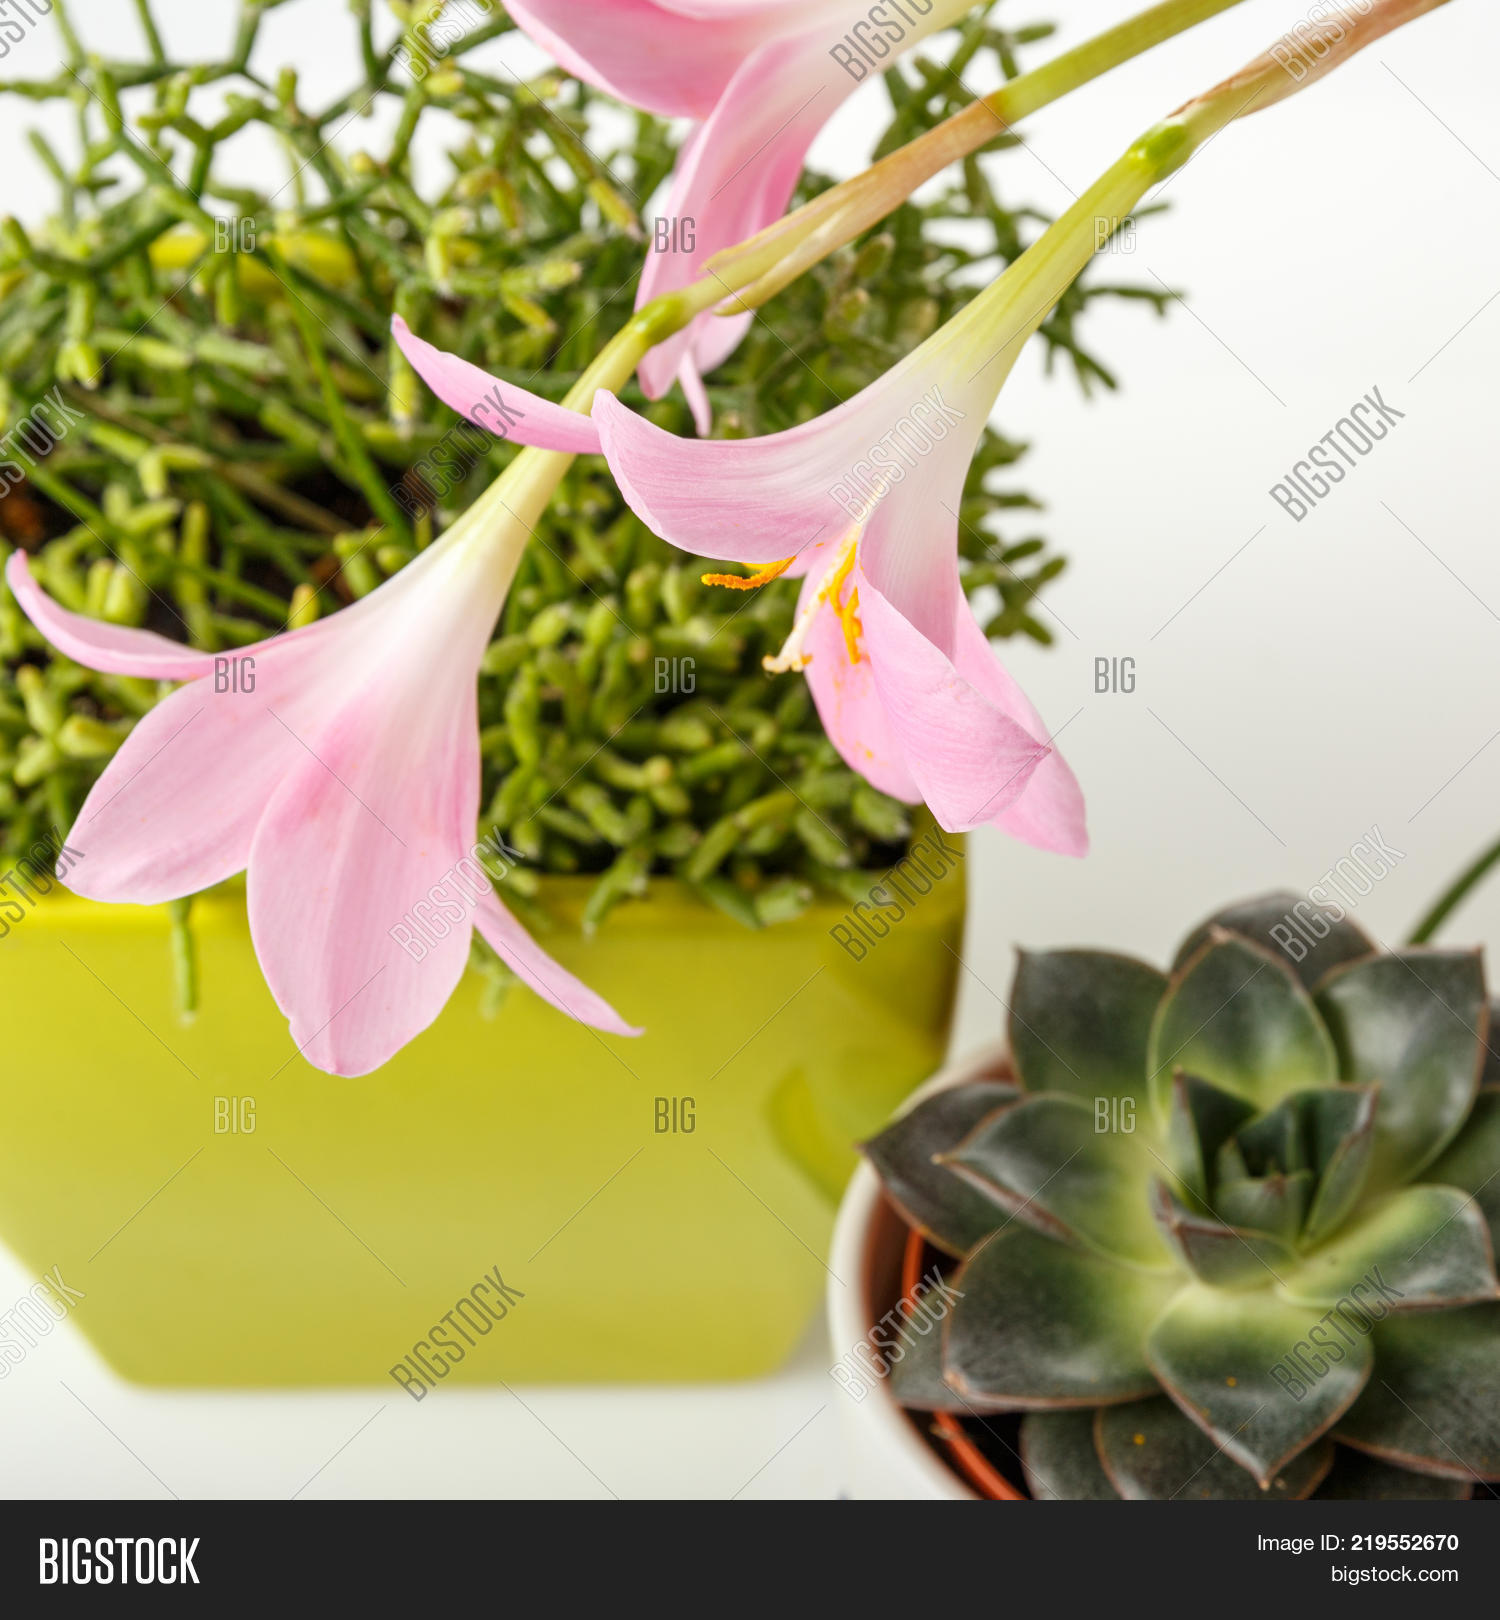 Succulent Plants Image Photo Free Trial Bigstock